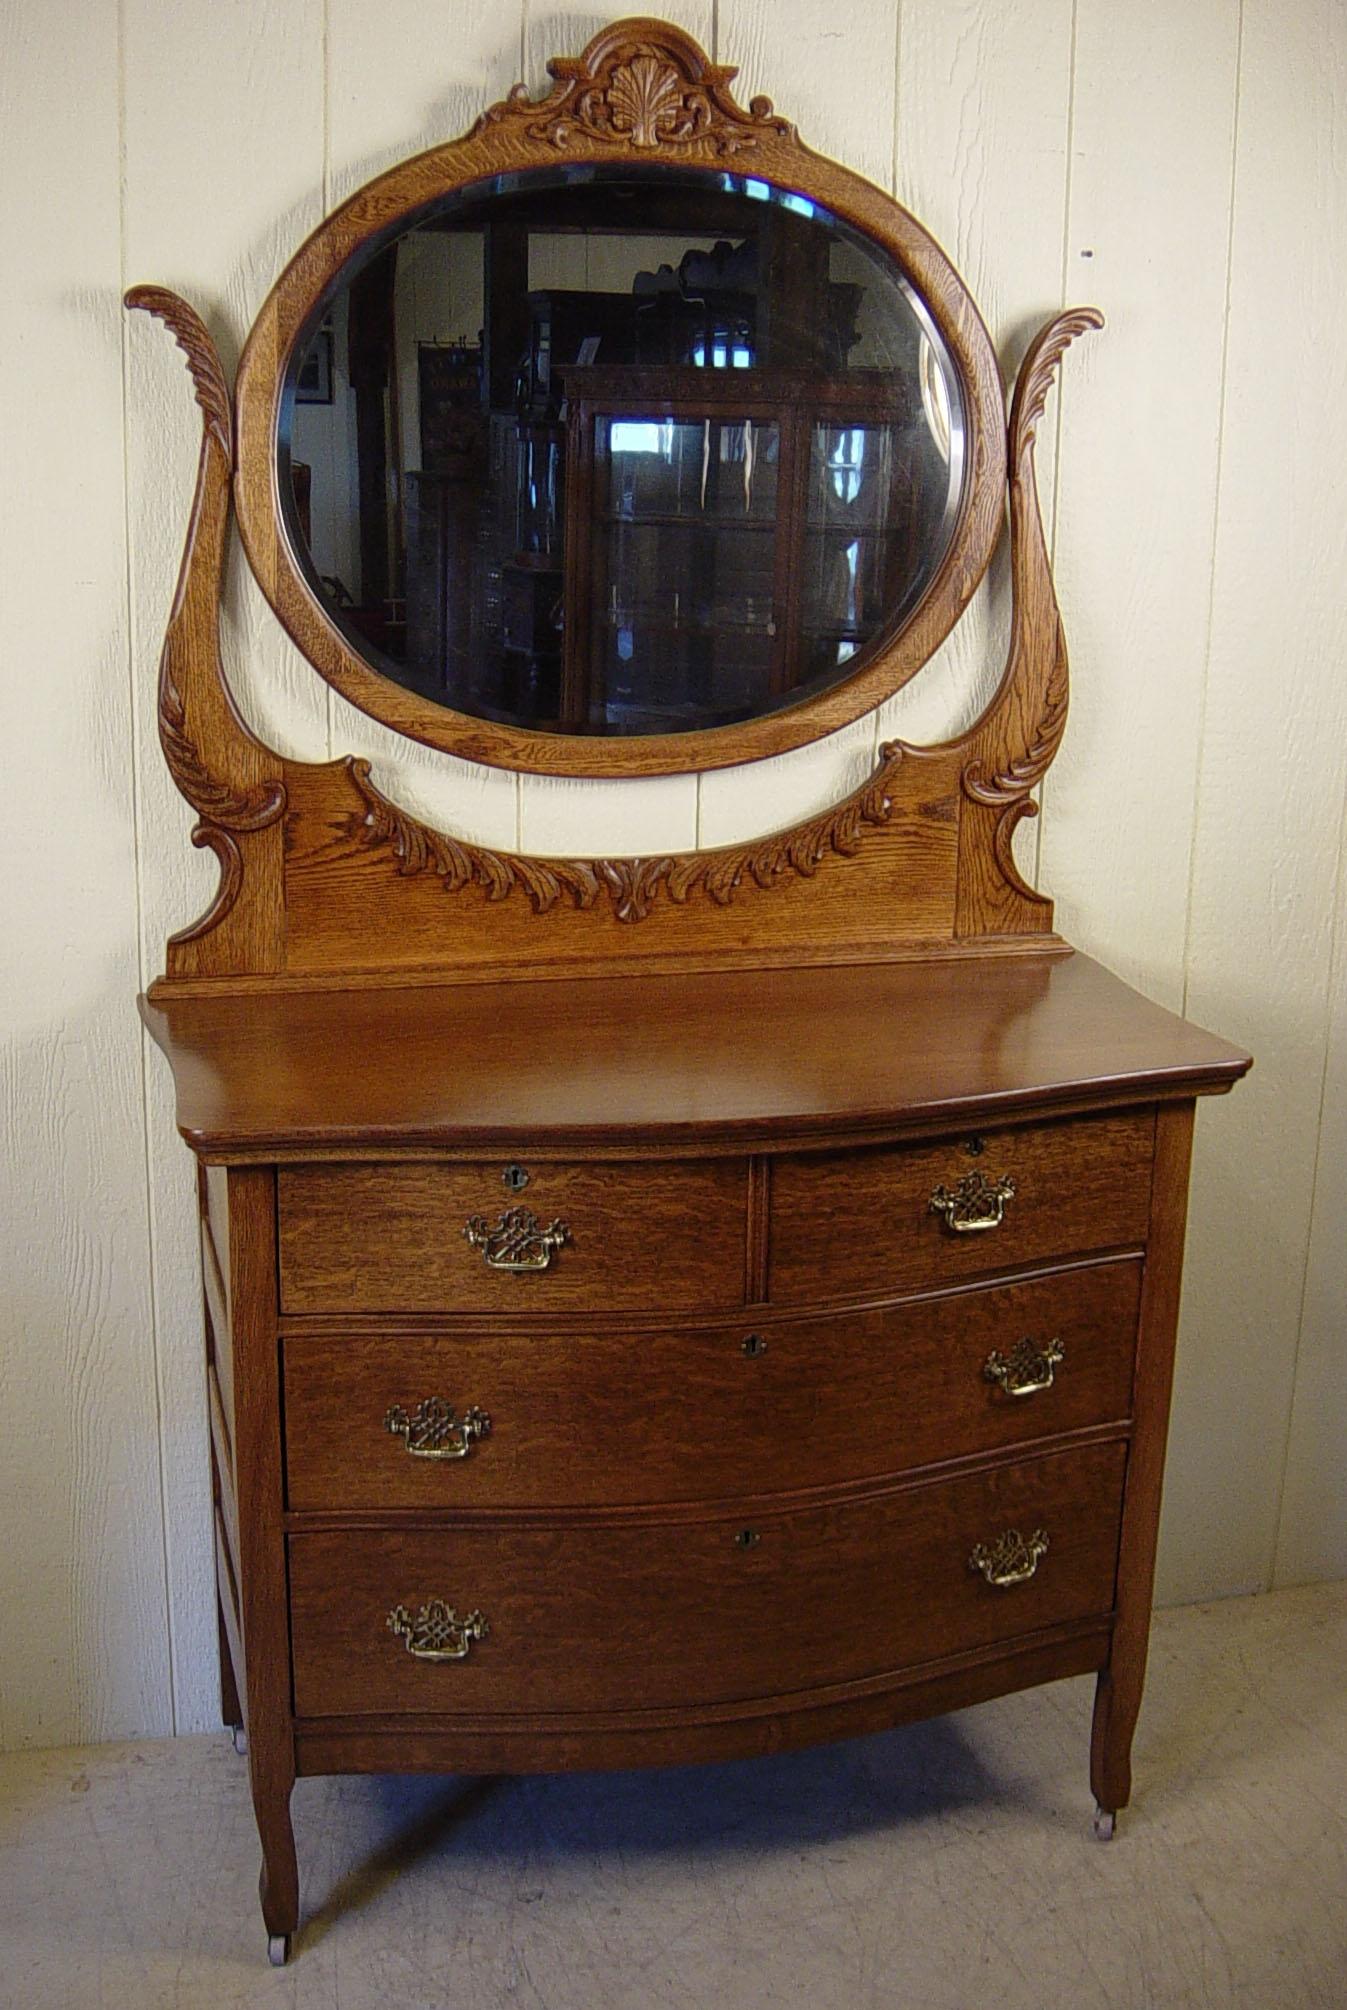 Antique Dresser With Oval Mirror Oak Best Antique 2017 Regarding Antique Oak Mirrors (Image 4 of 15)